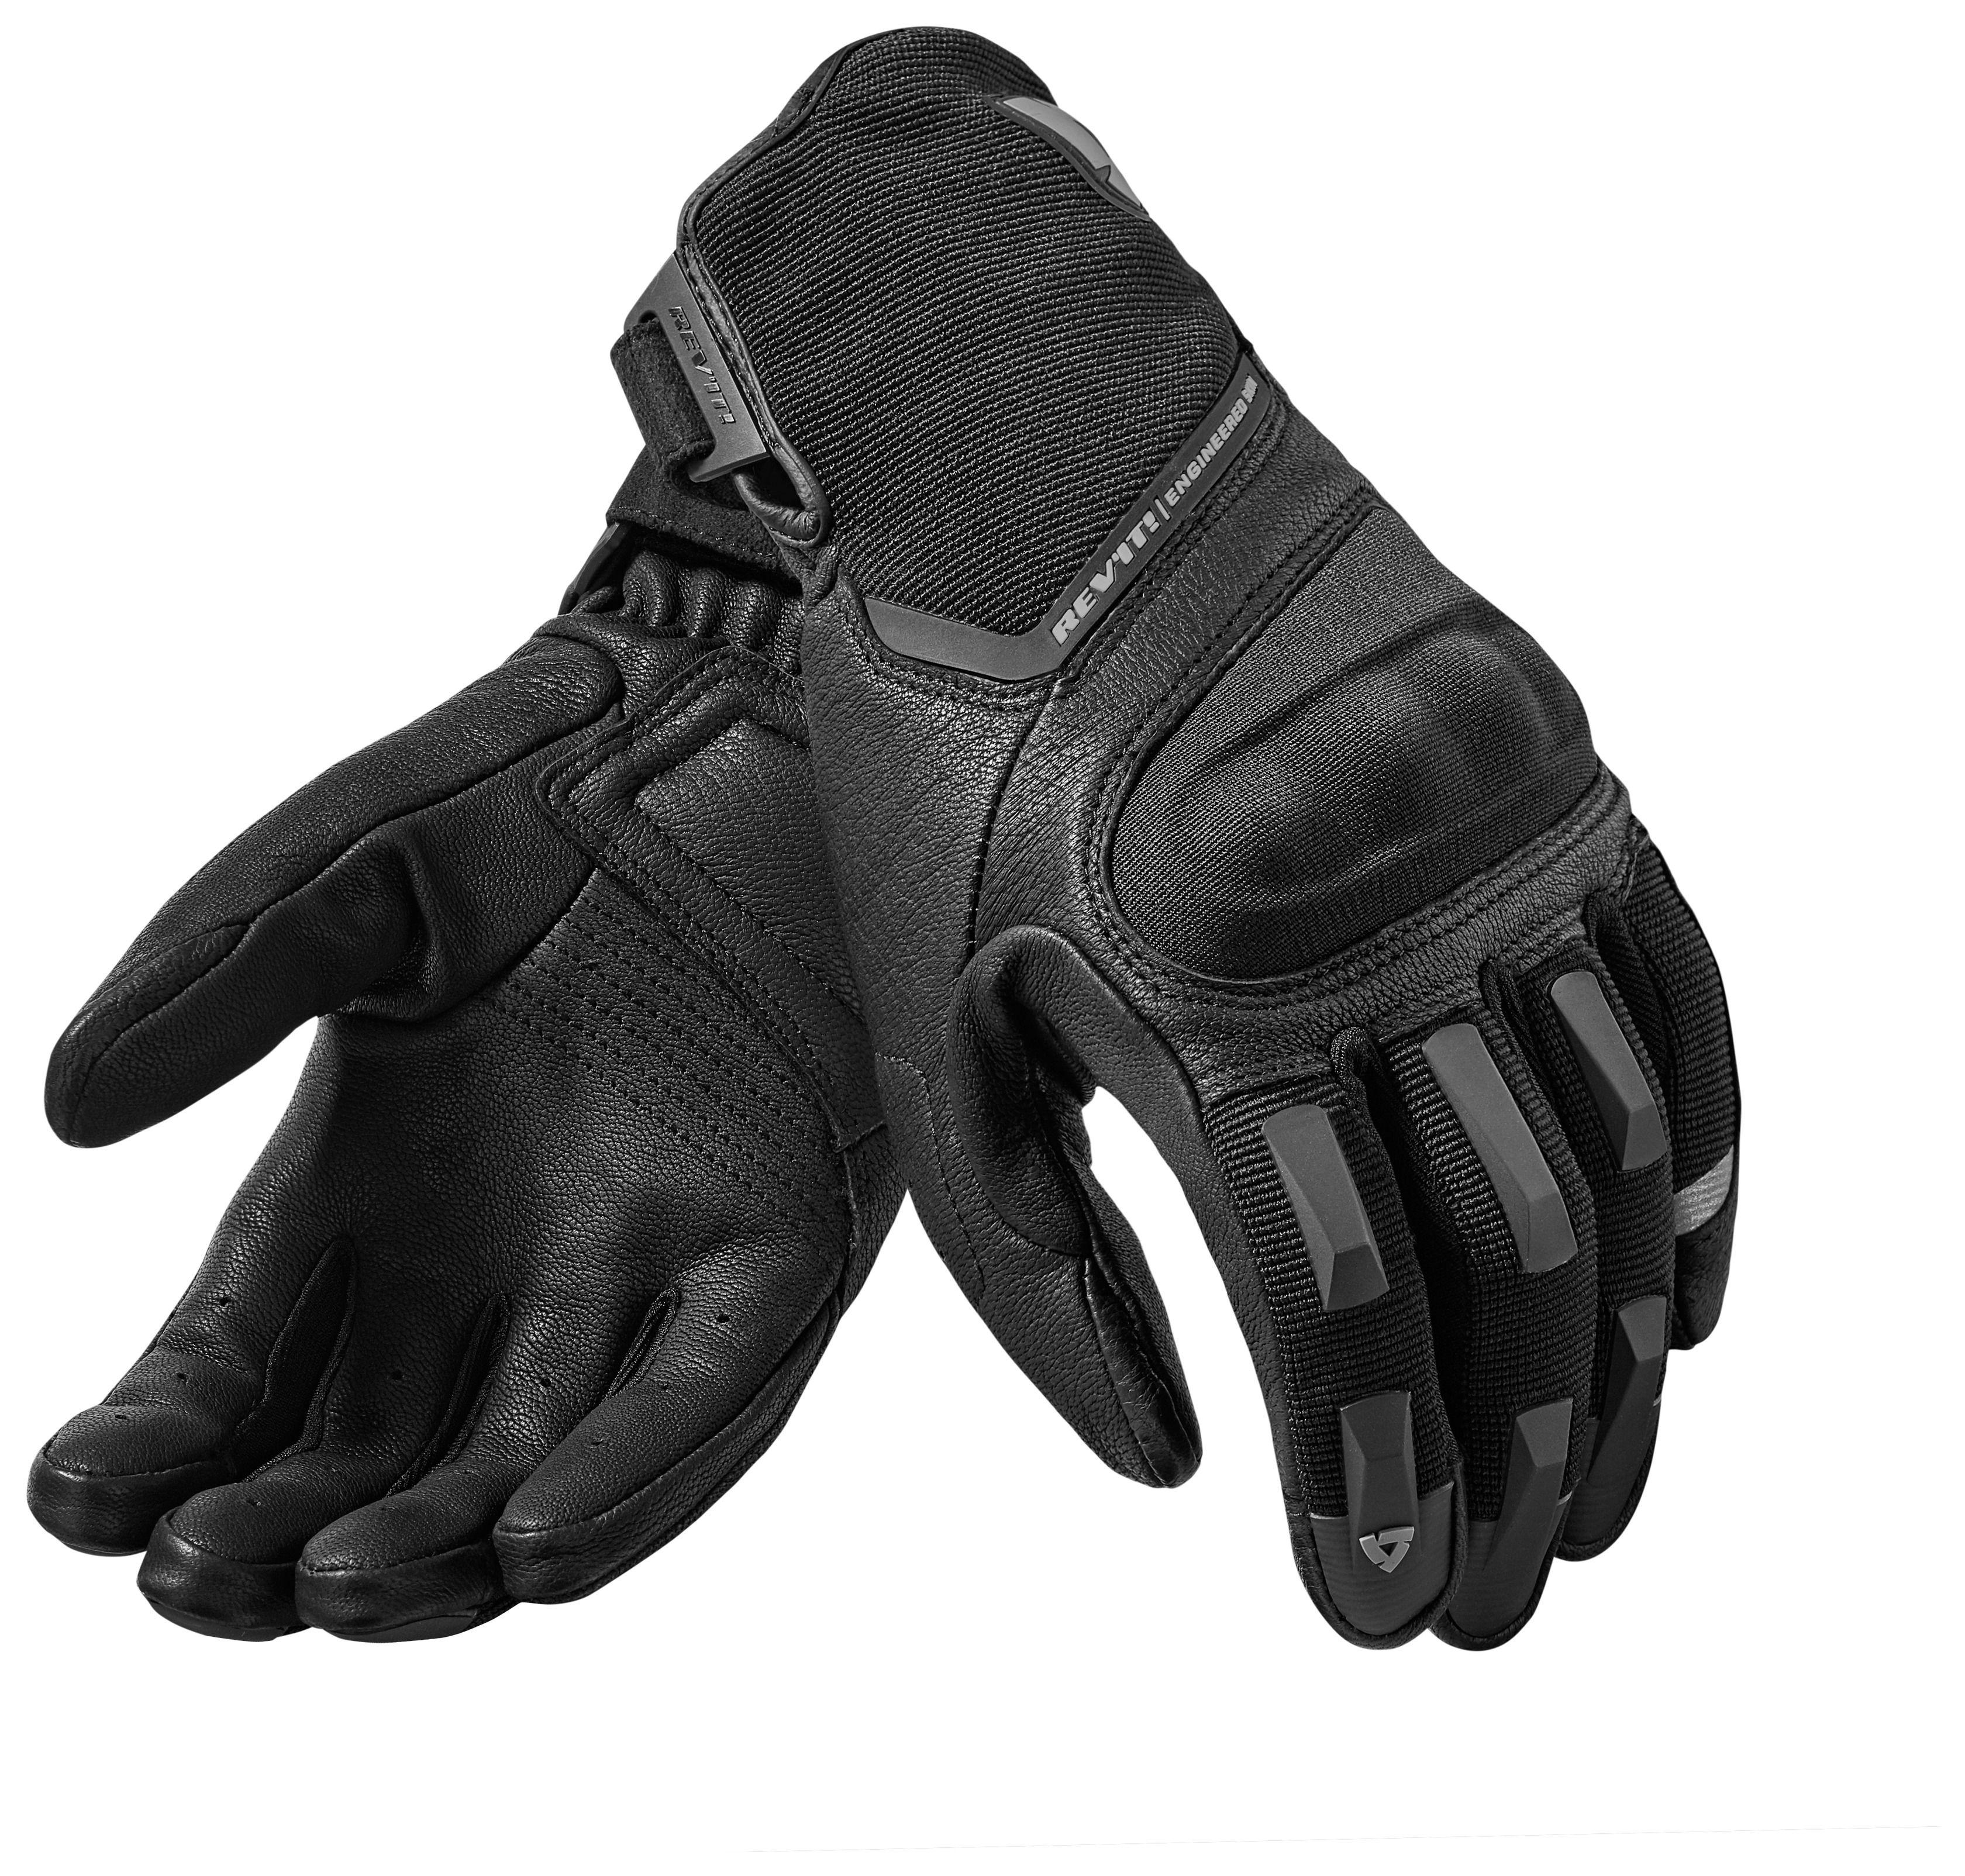 Motorcycle gloves to prevent numbness - Striker 2 Gloves Revzilla